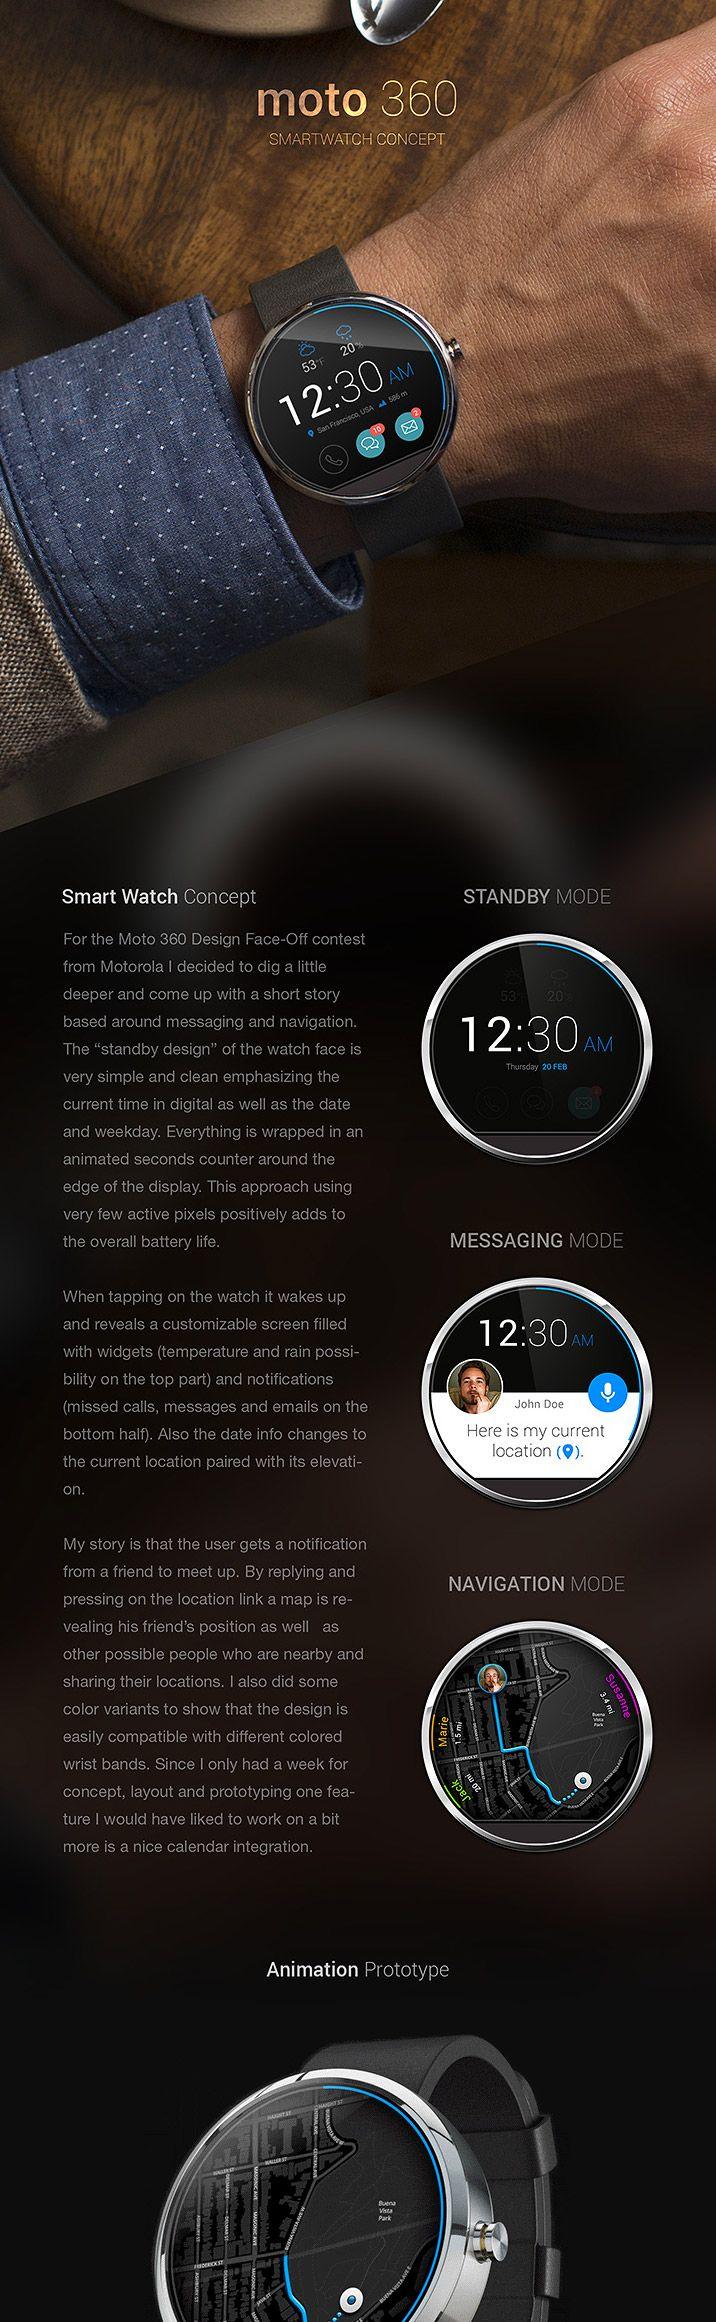 23 Smartwatch UI Designs & Concepts